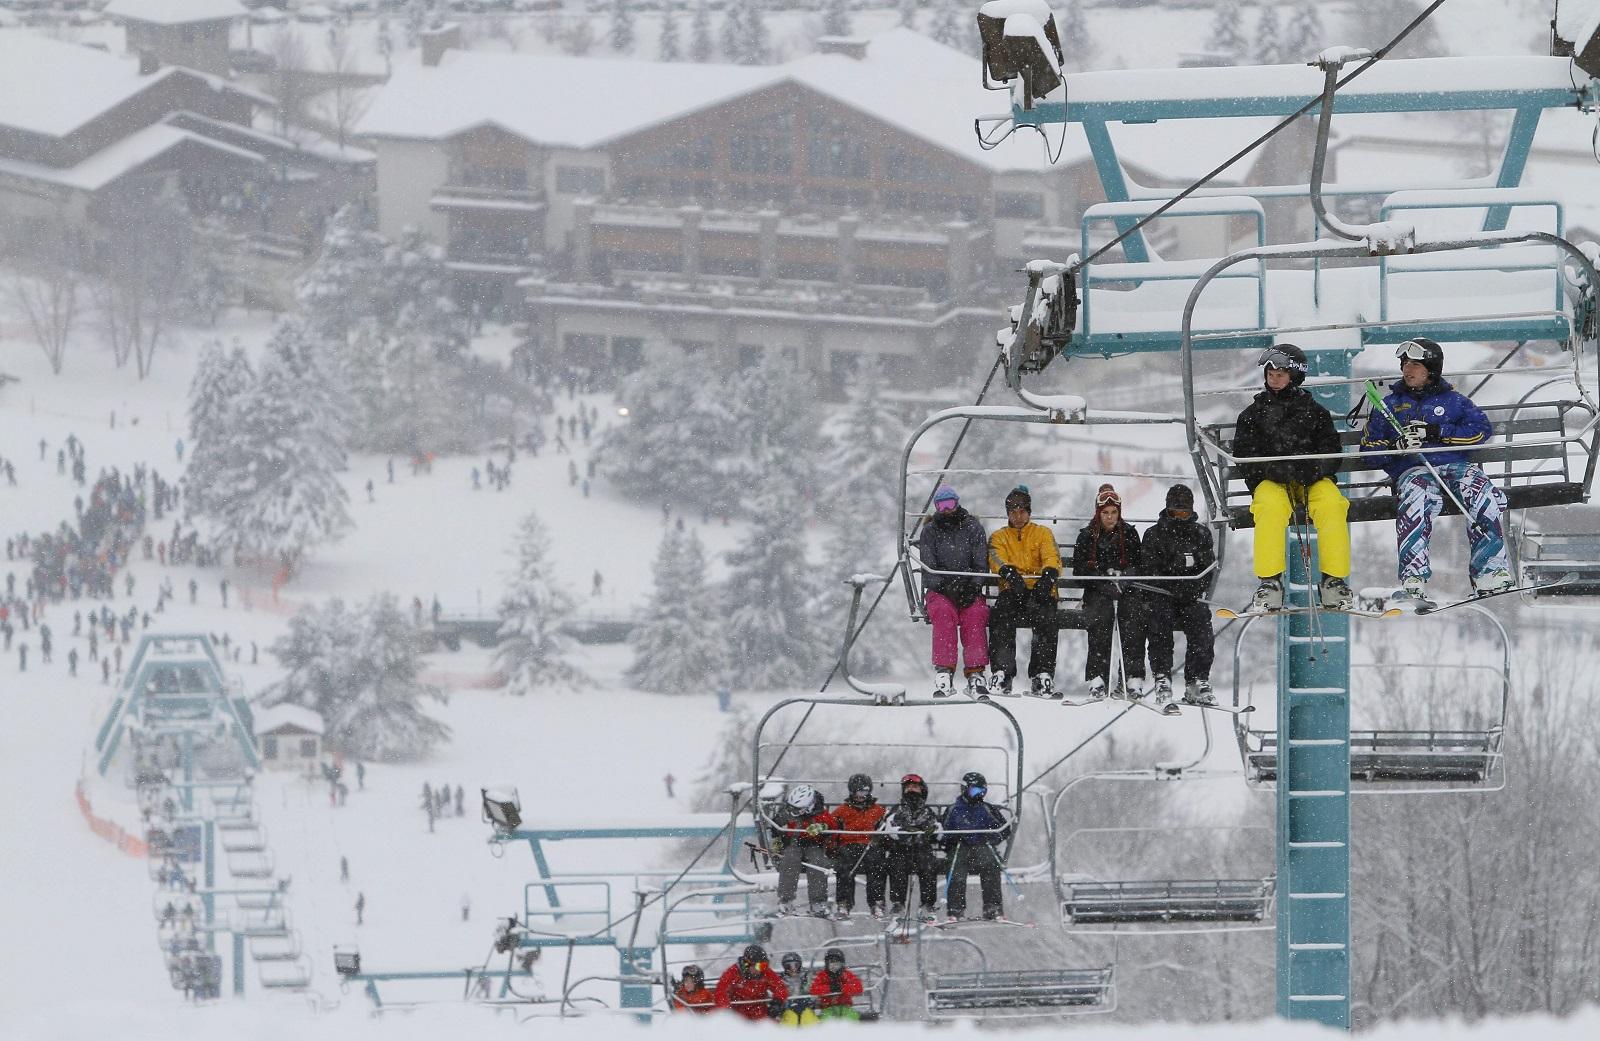 Holiday Valley: 'Stop using anti-winter language'